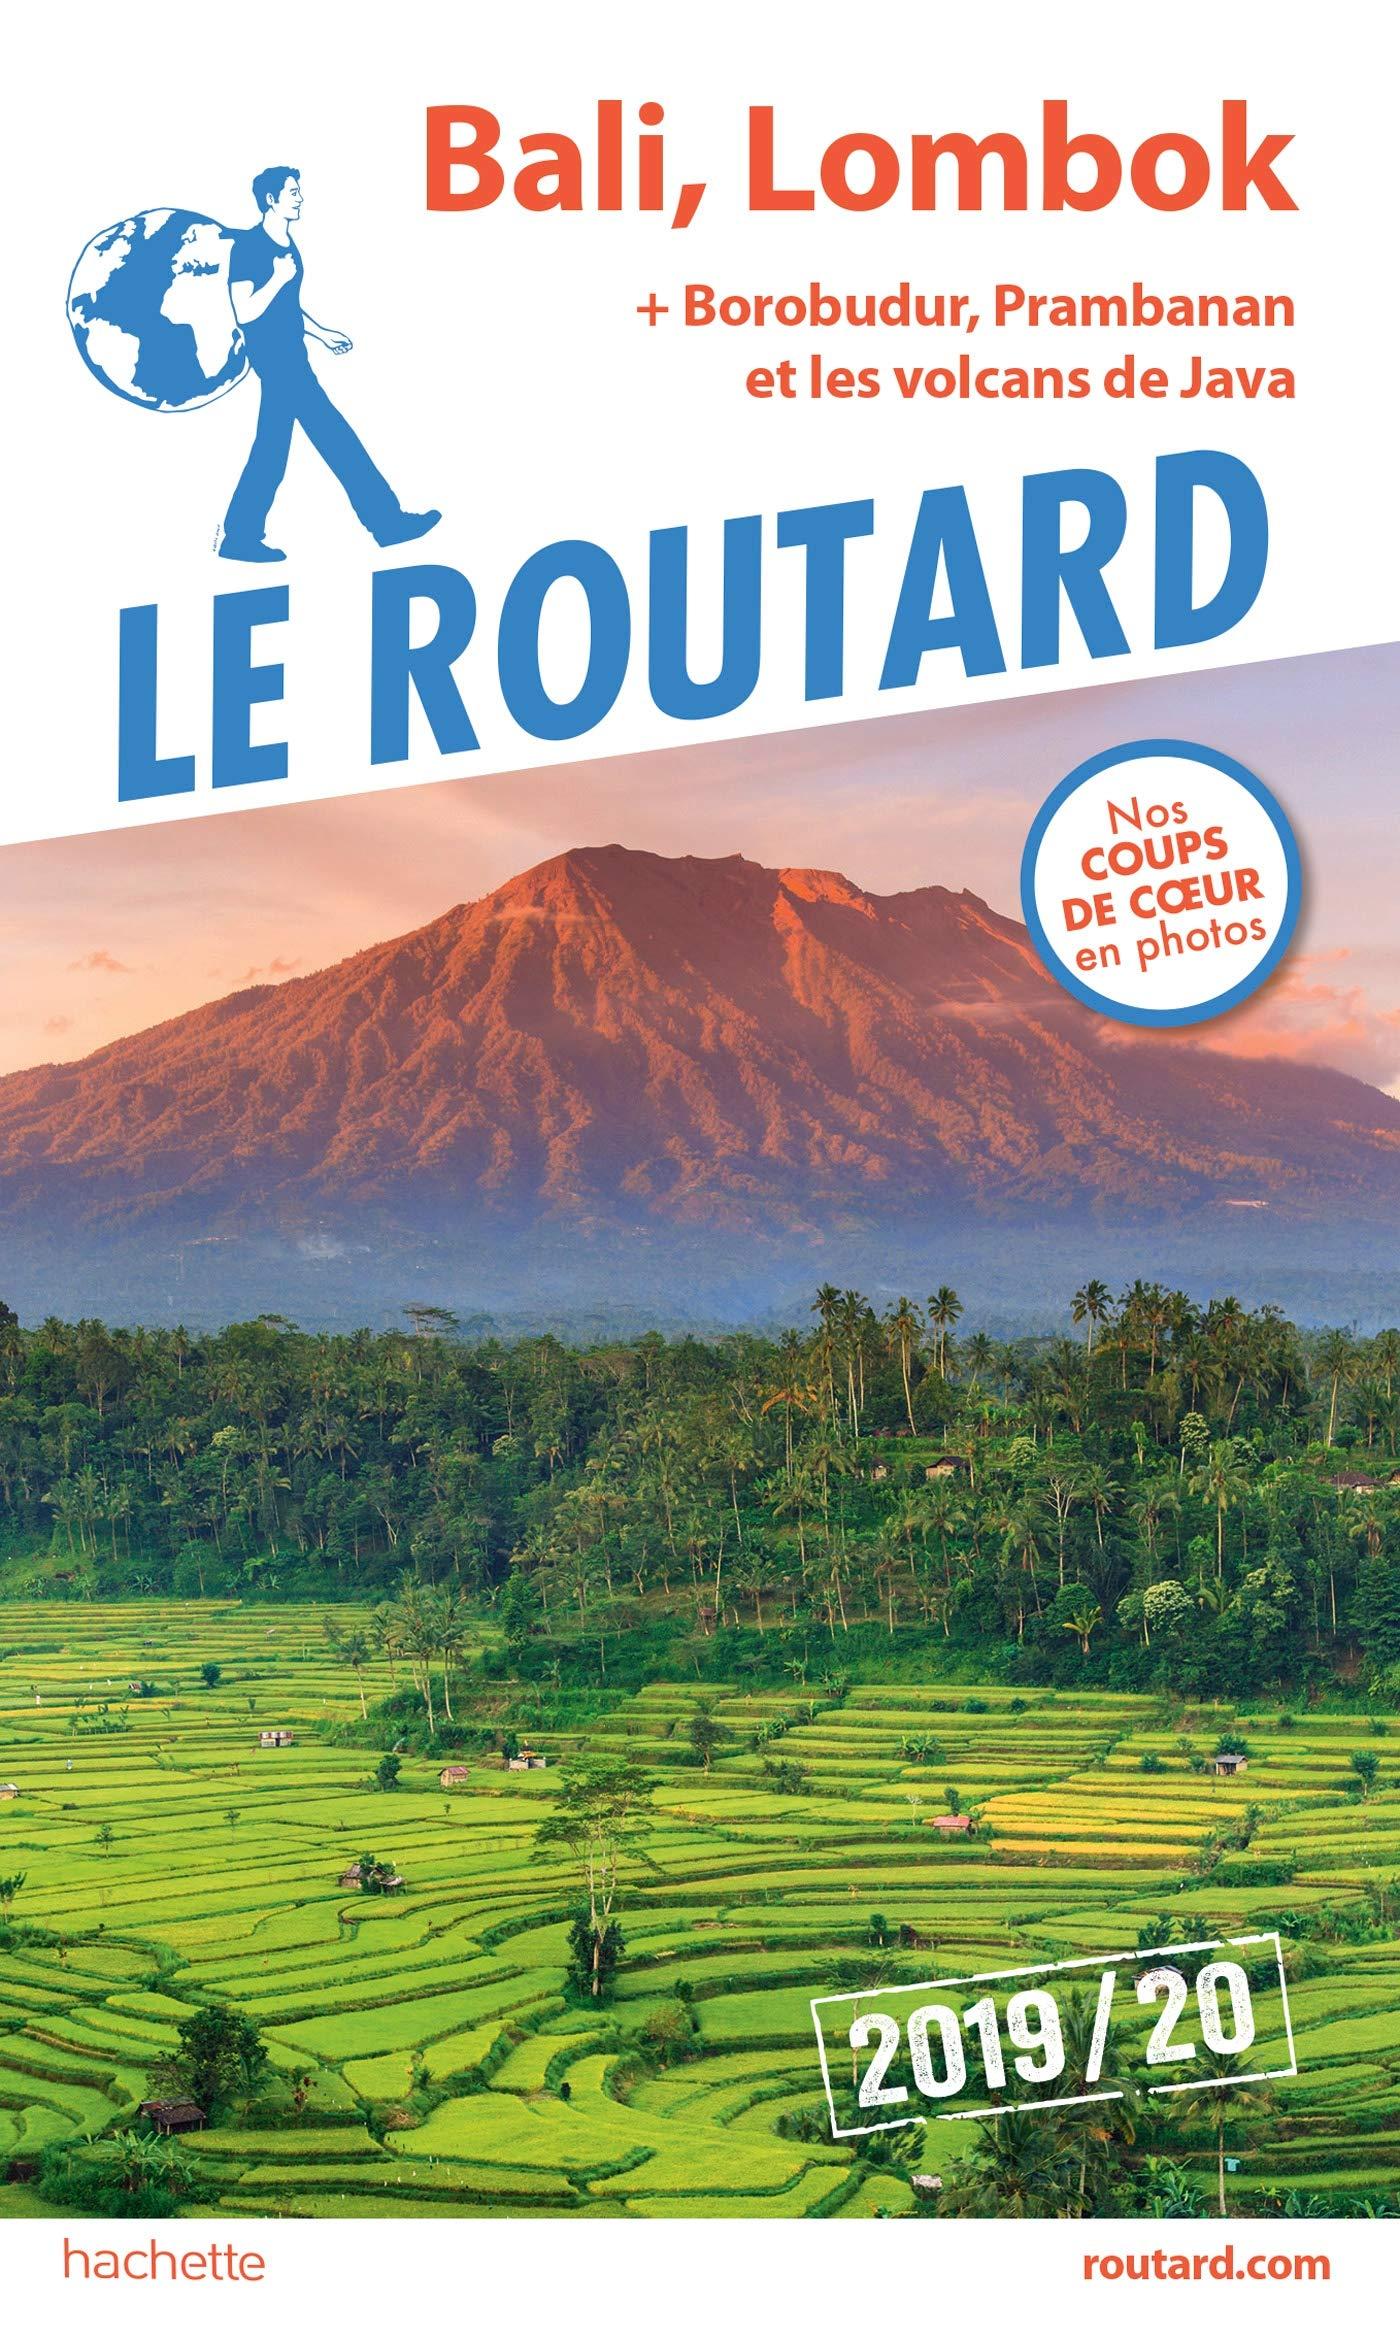 Carte Bali Routard.Amazon Fr Guide Du Routard Bali Lombok Borobudur